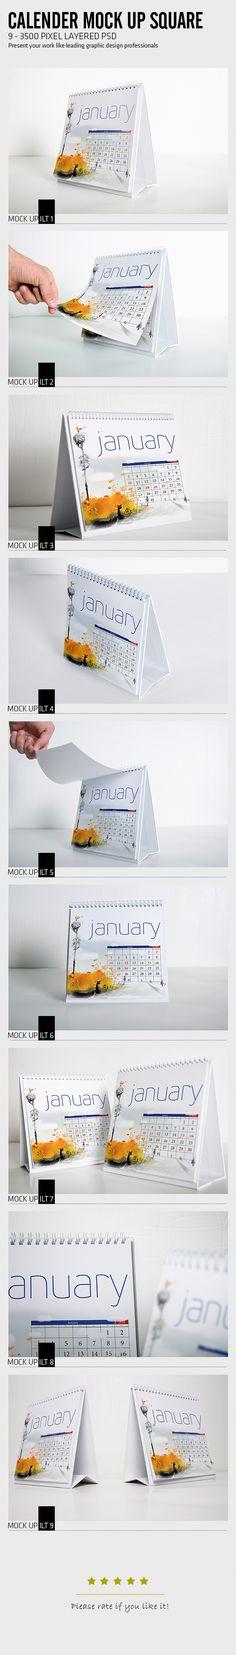 Desk Calendar Mockup Set  adaptive, business, calendar, calendar mockup, calender, calendrier, date, day, design, desk, desk calendar, desktop, desktop calendar, mock-up, mockup, month, page, paper, photorealistic, print, realistic, seasonal, spiral, table calendar, template, time, week, weekend, year, year calendar, takvim, masa takvimi, kare takvim, duvar takvimi,